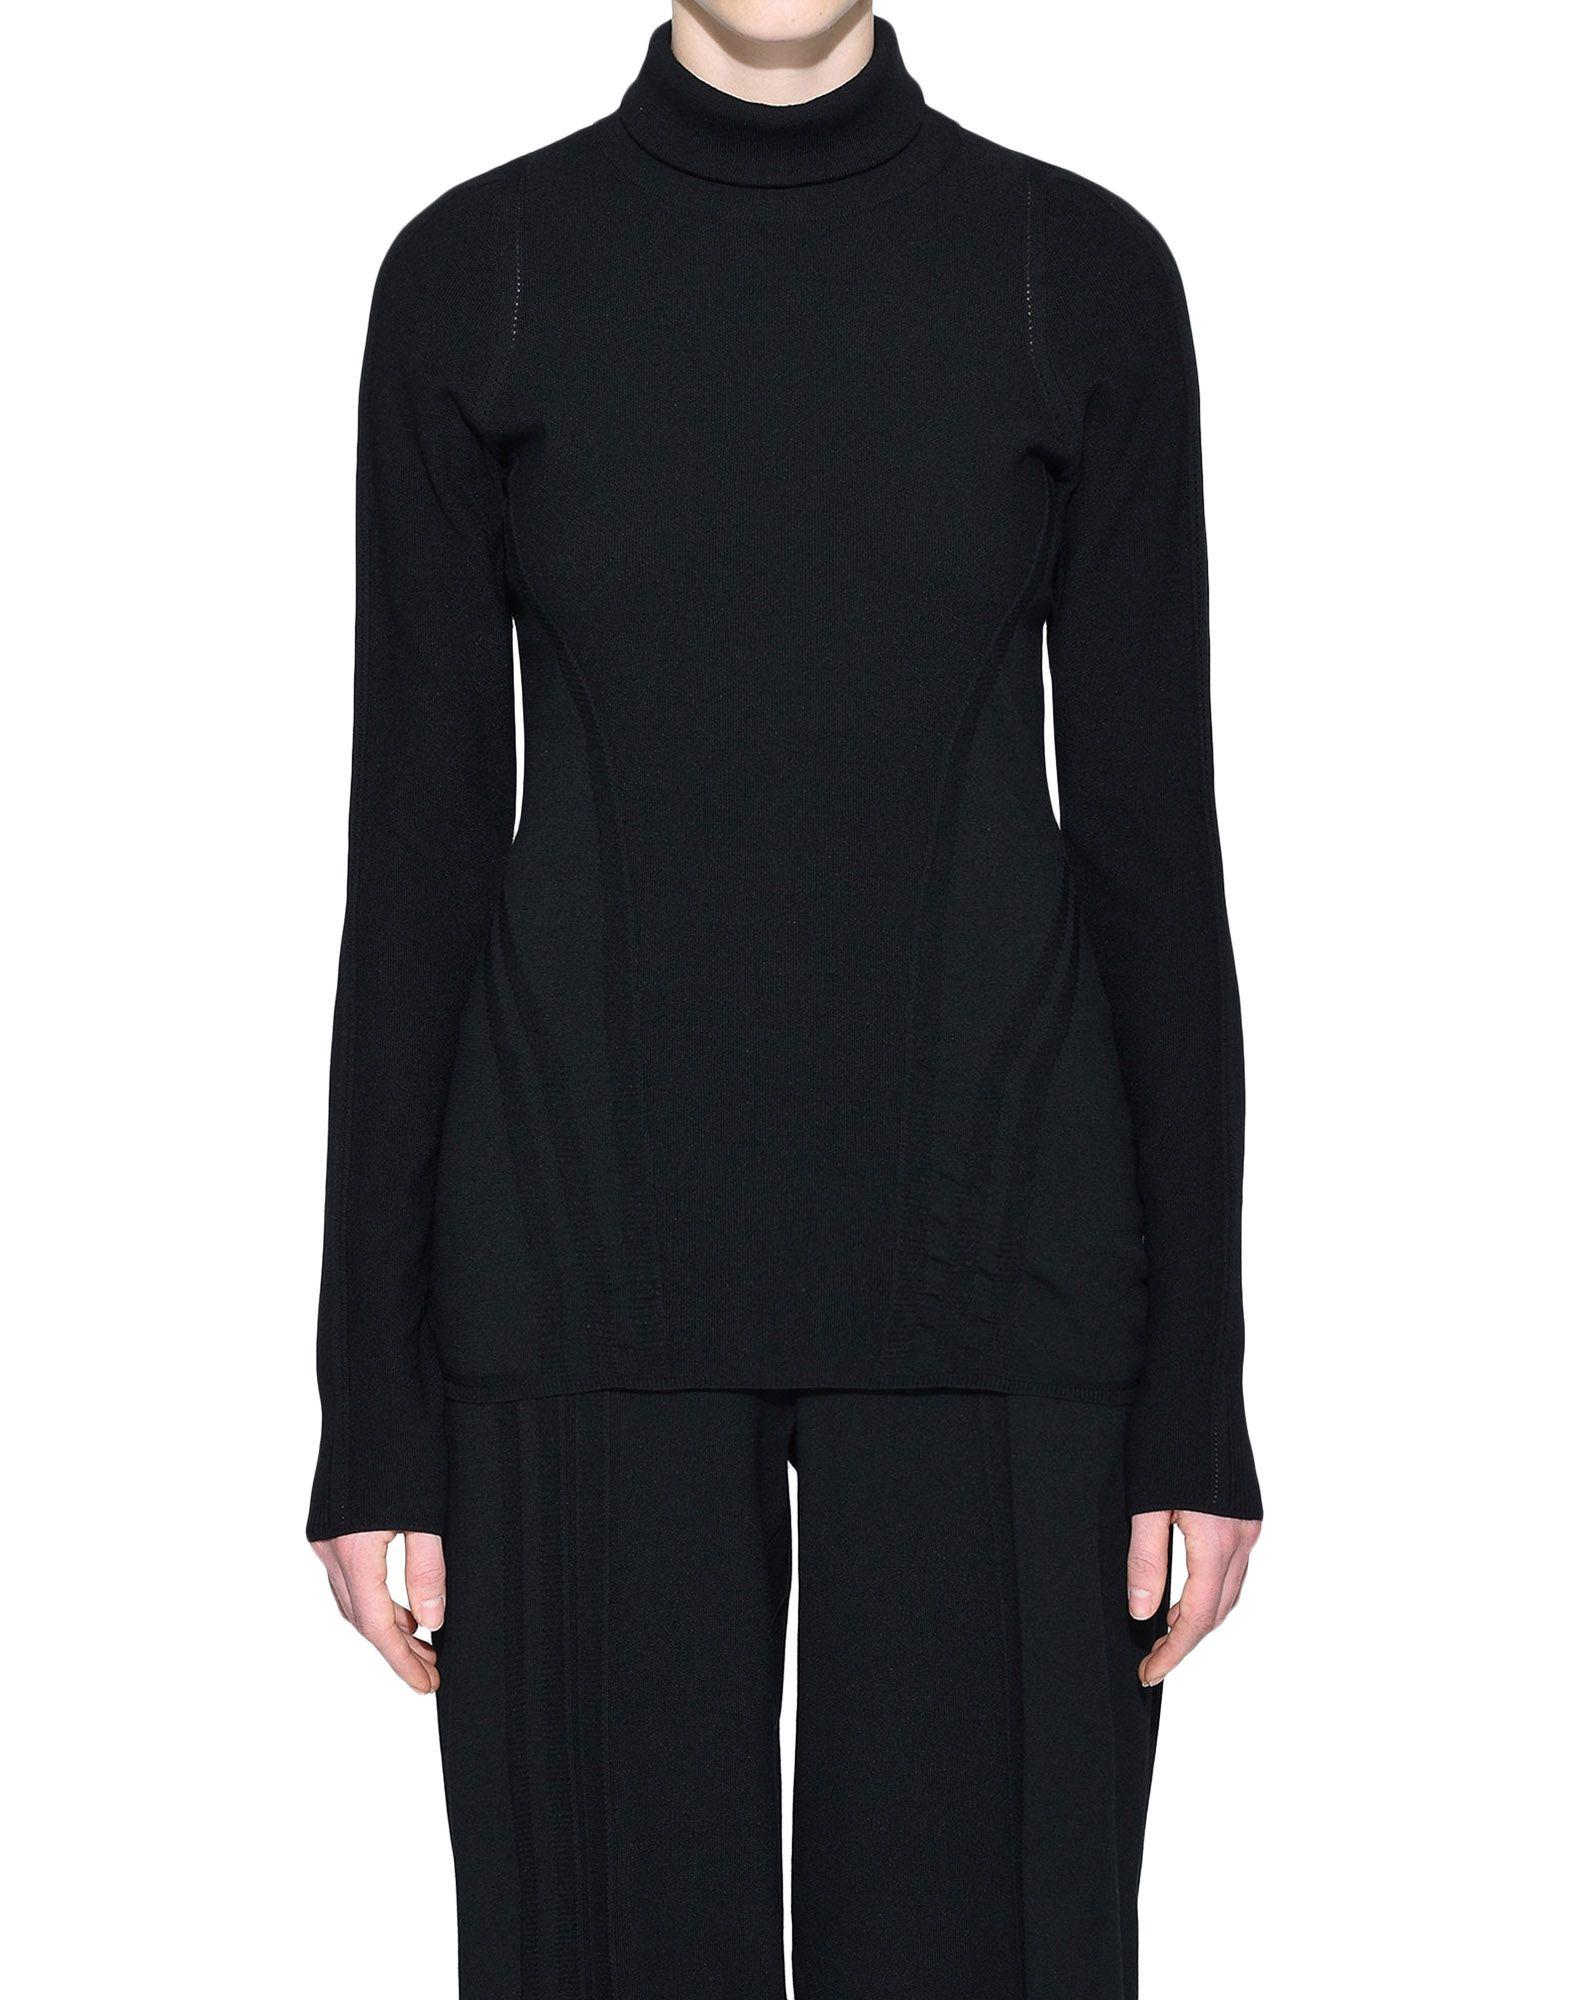 Y-3 Y-3 Tech Wool High Neck Tee Long sleeve t-shirt Woman r